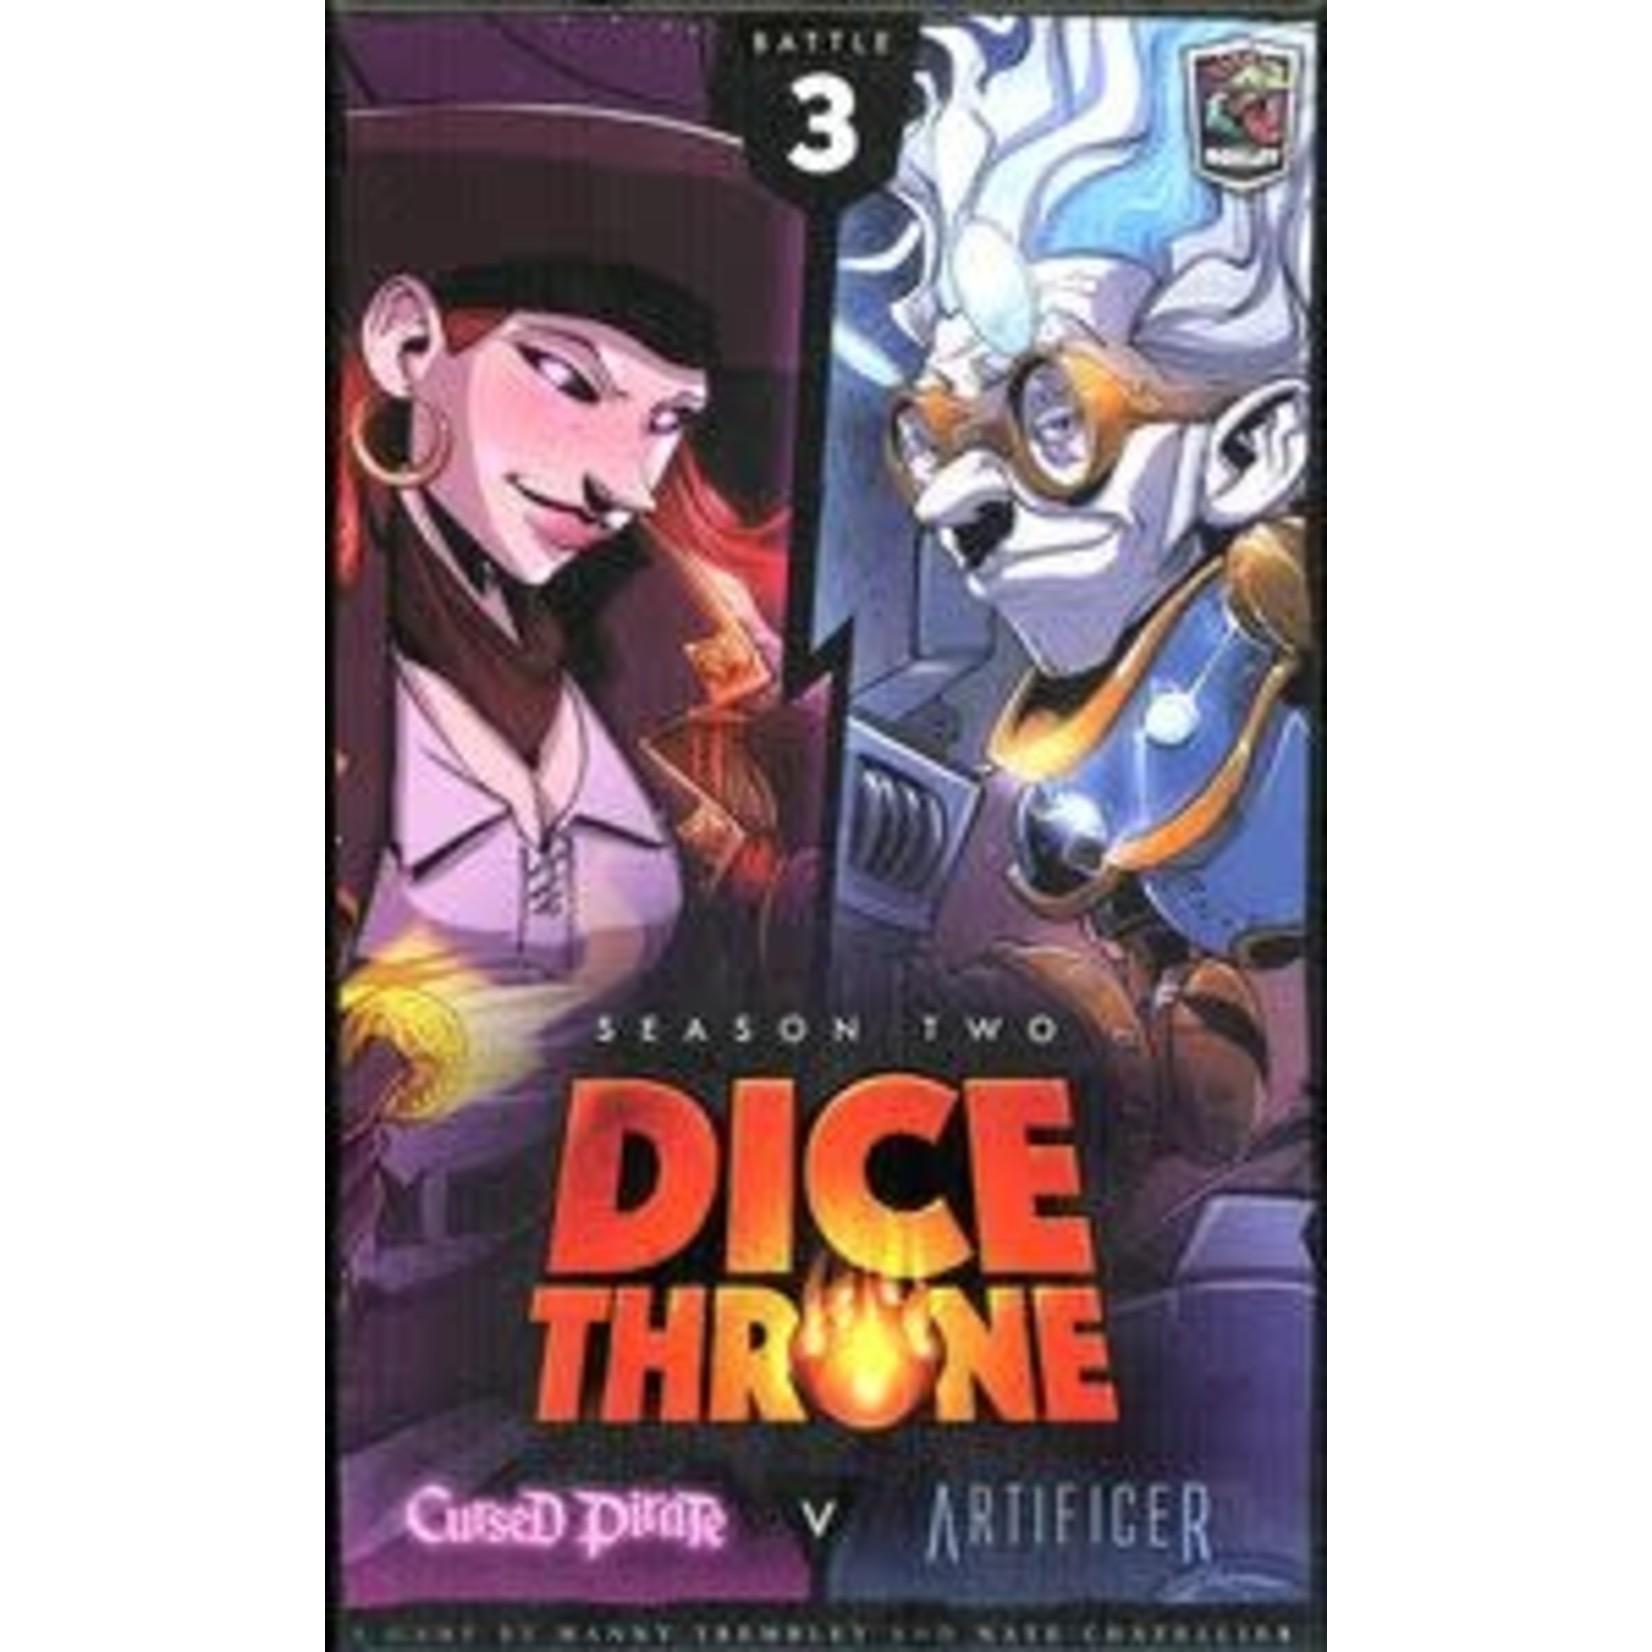 Dice Throne Season 2: Cursed Pirate vs. Artificer